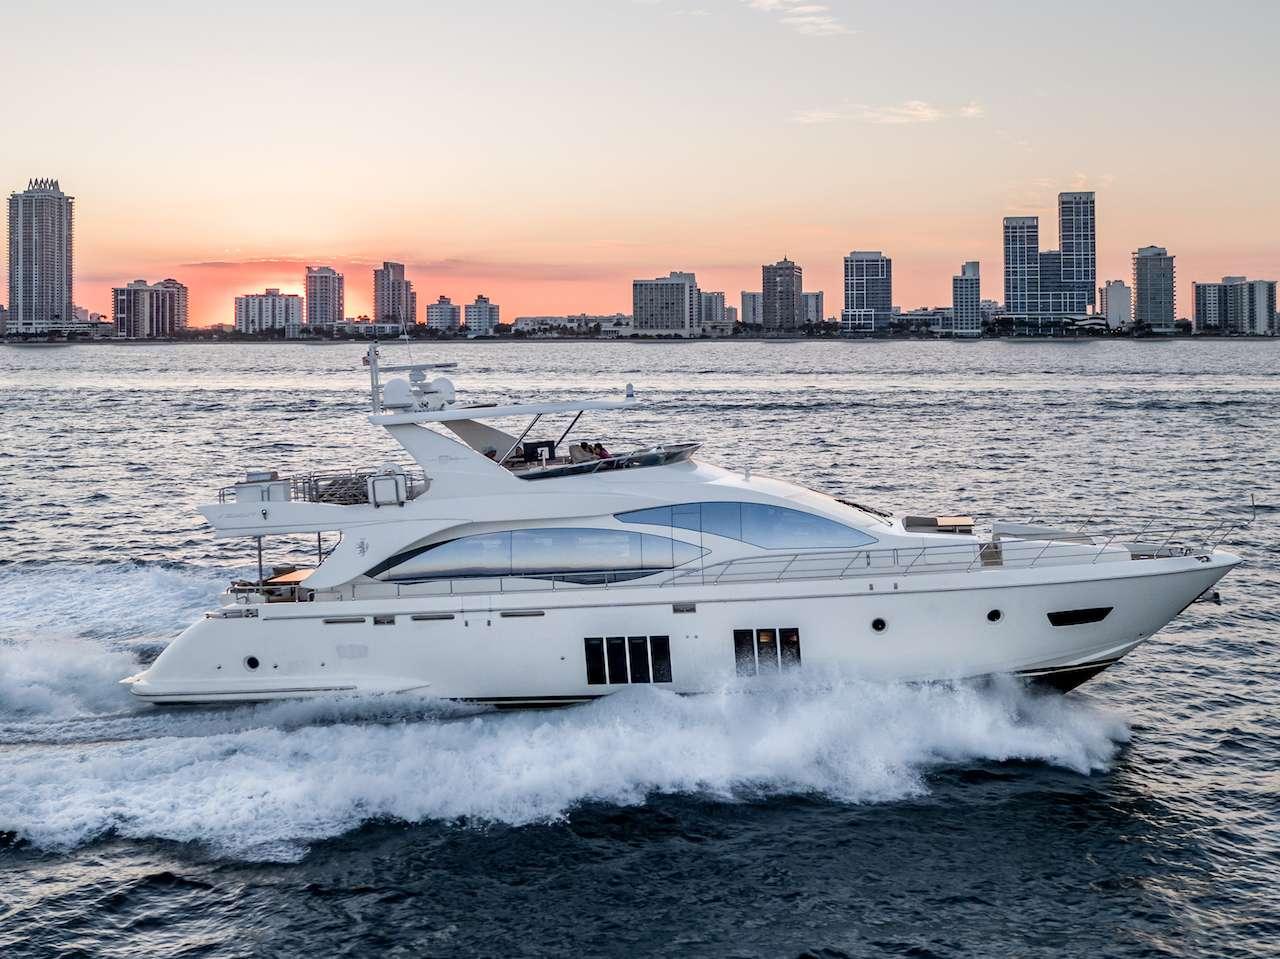 Motor yacht PHOENIX - Main shot